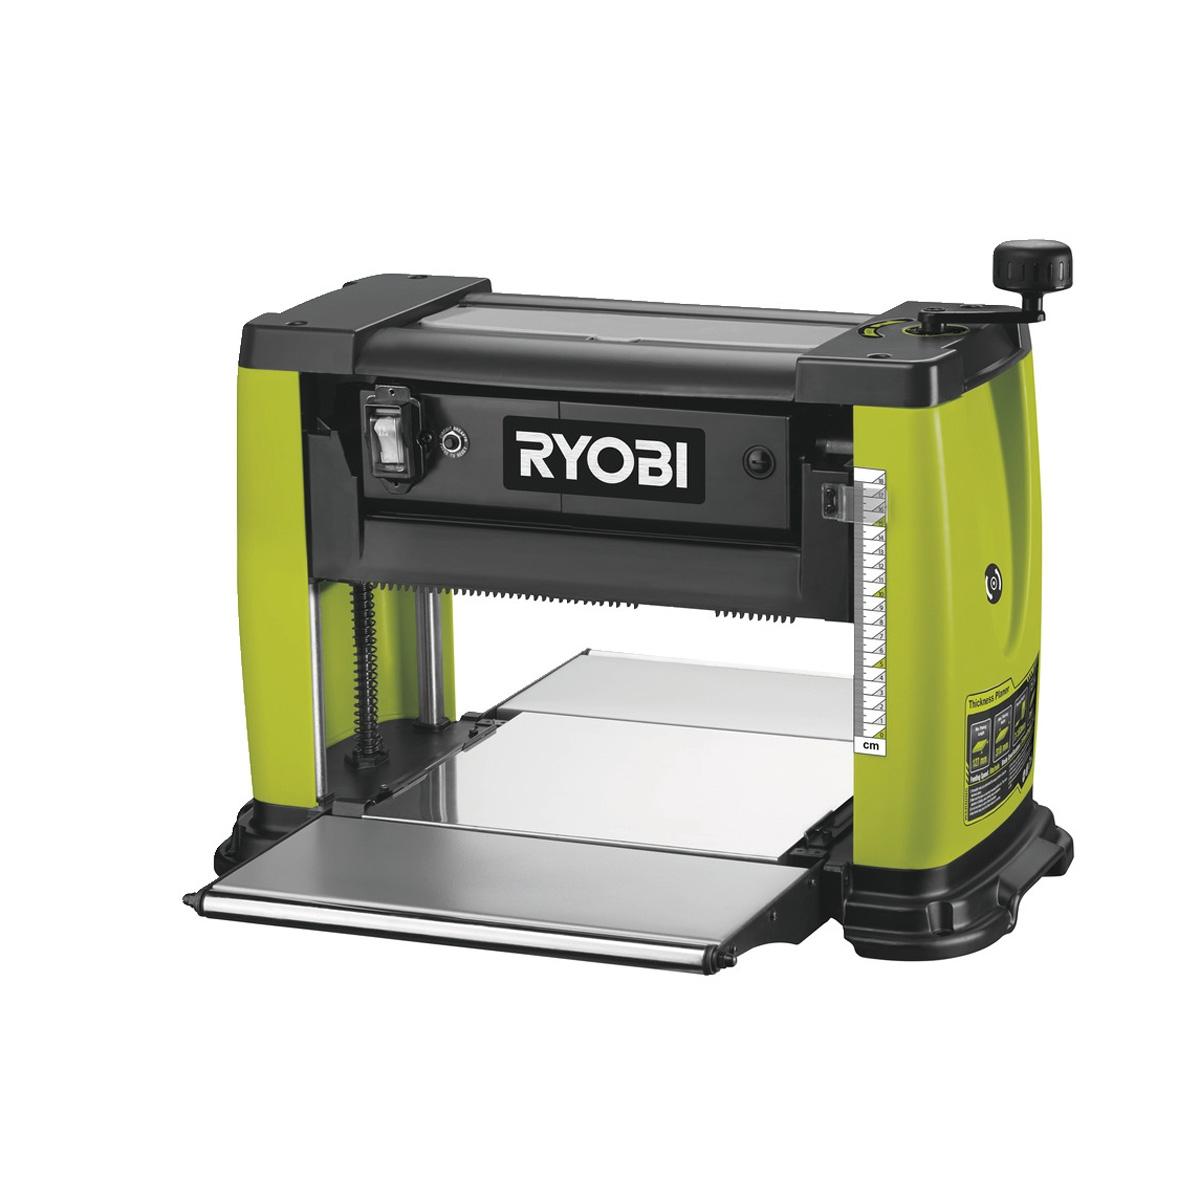 Cepilladora fija RYOBI RAP1500G